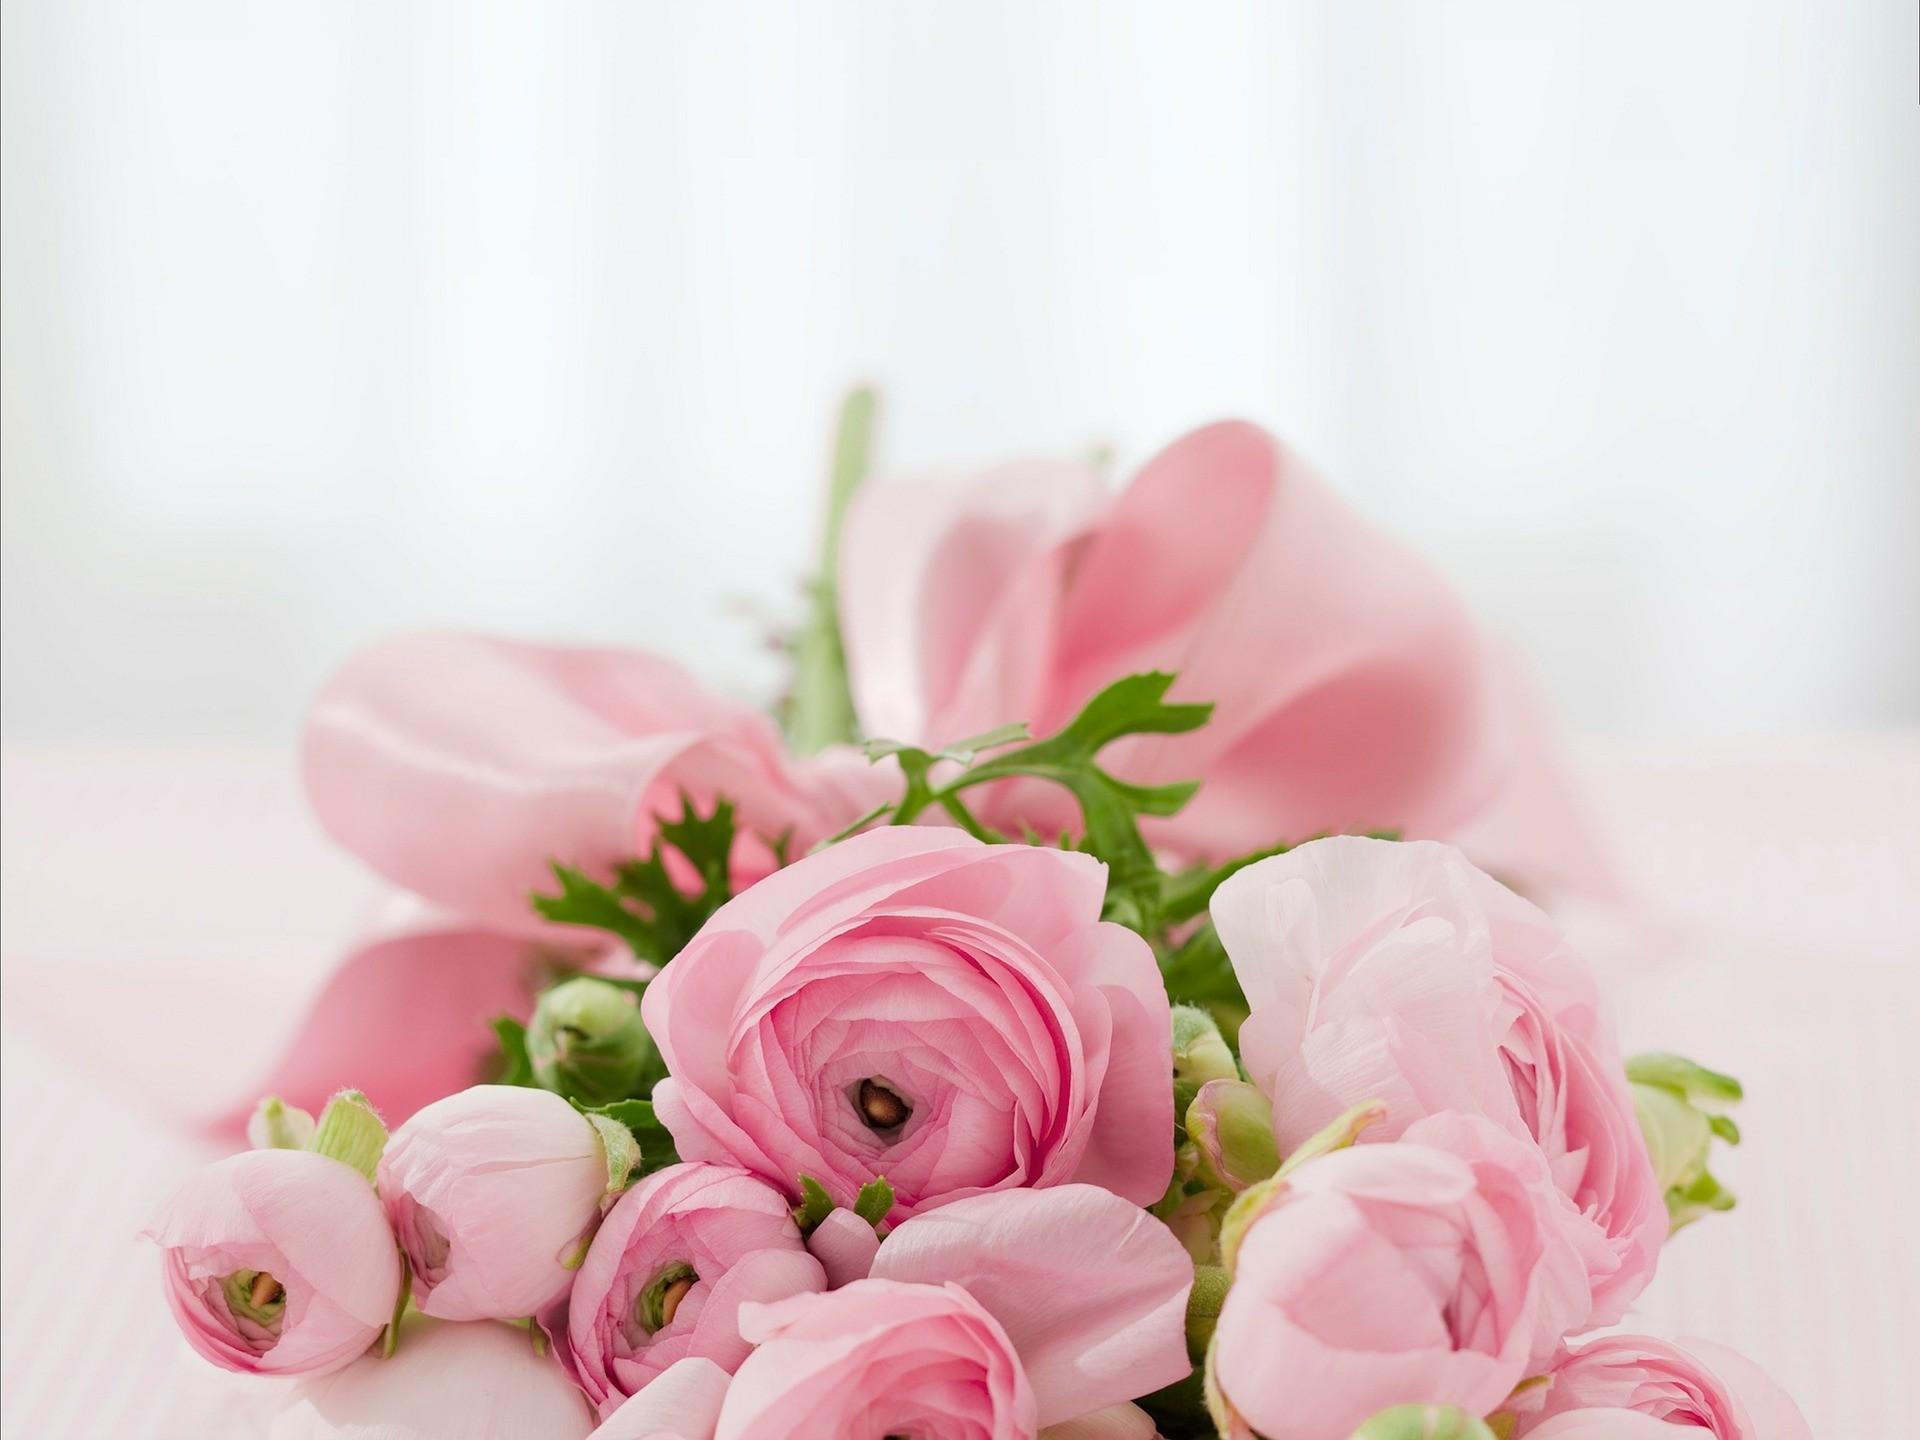 roses 142876 1920